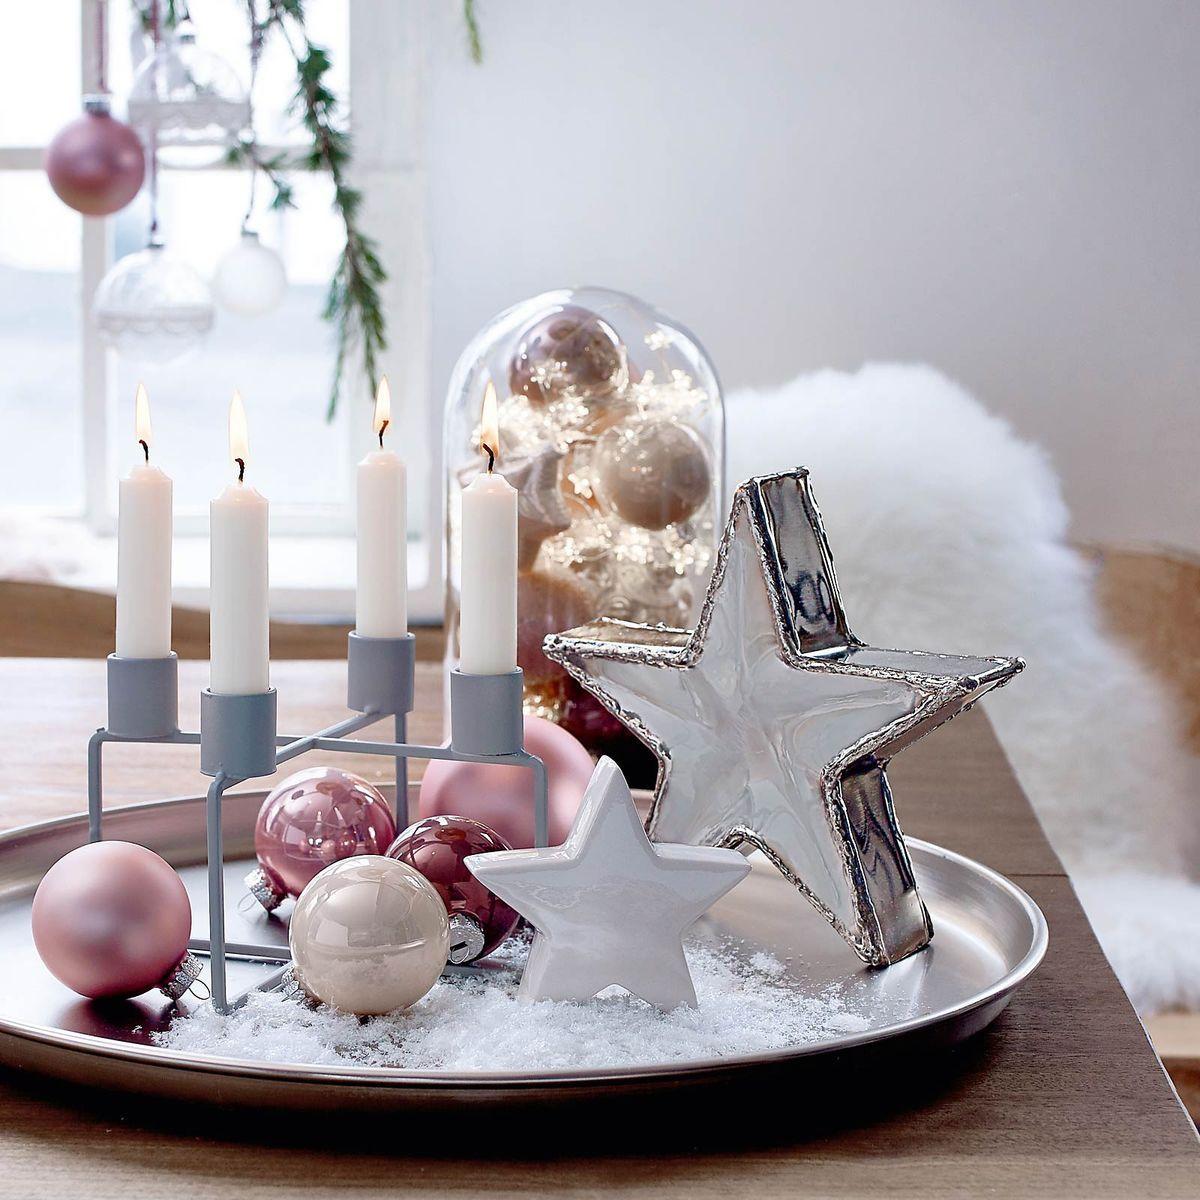 Dekoobjekt Stern, 10x10x3cm, weißDekoobjekt Stern, 10x10x3cm, weiß #xmastabledecorations